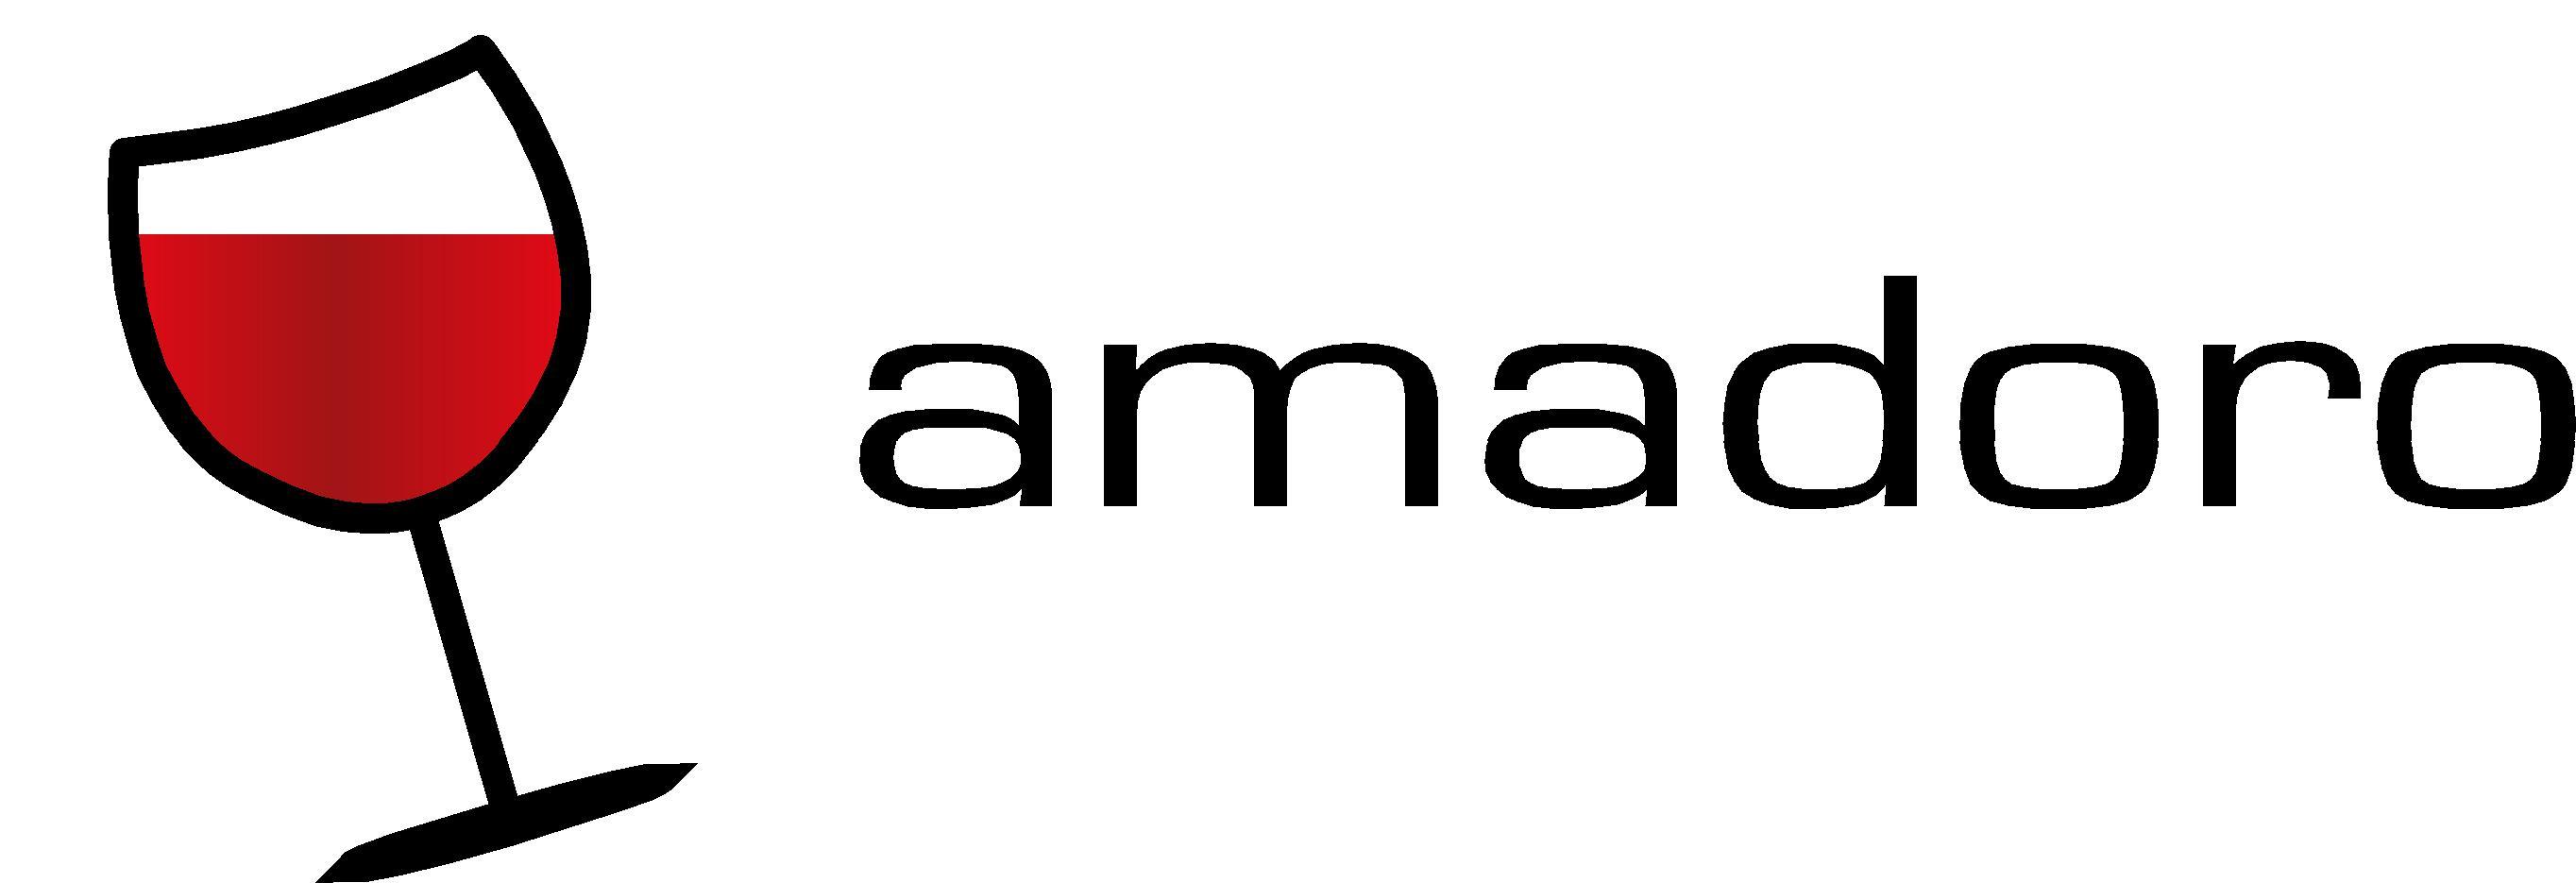 amadoro